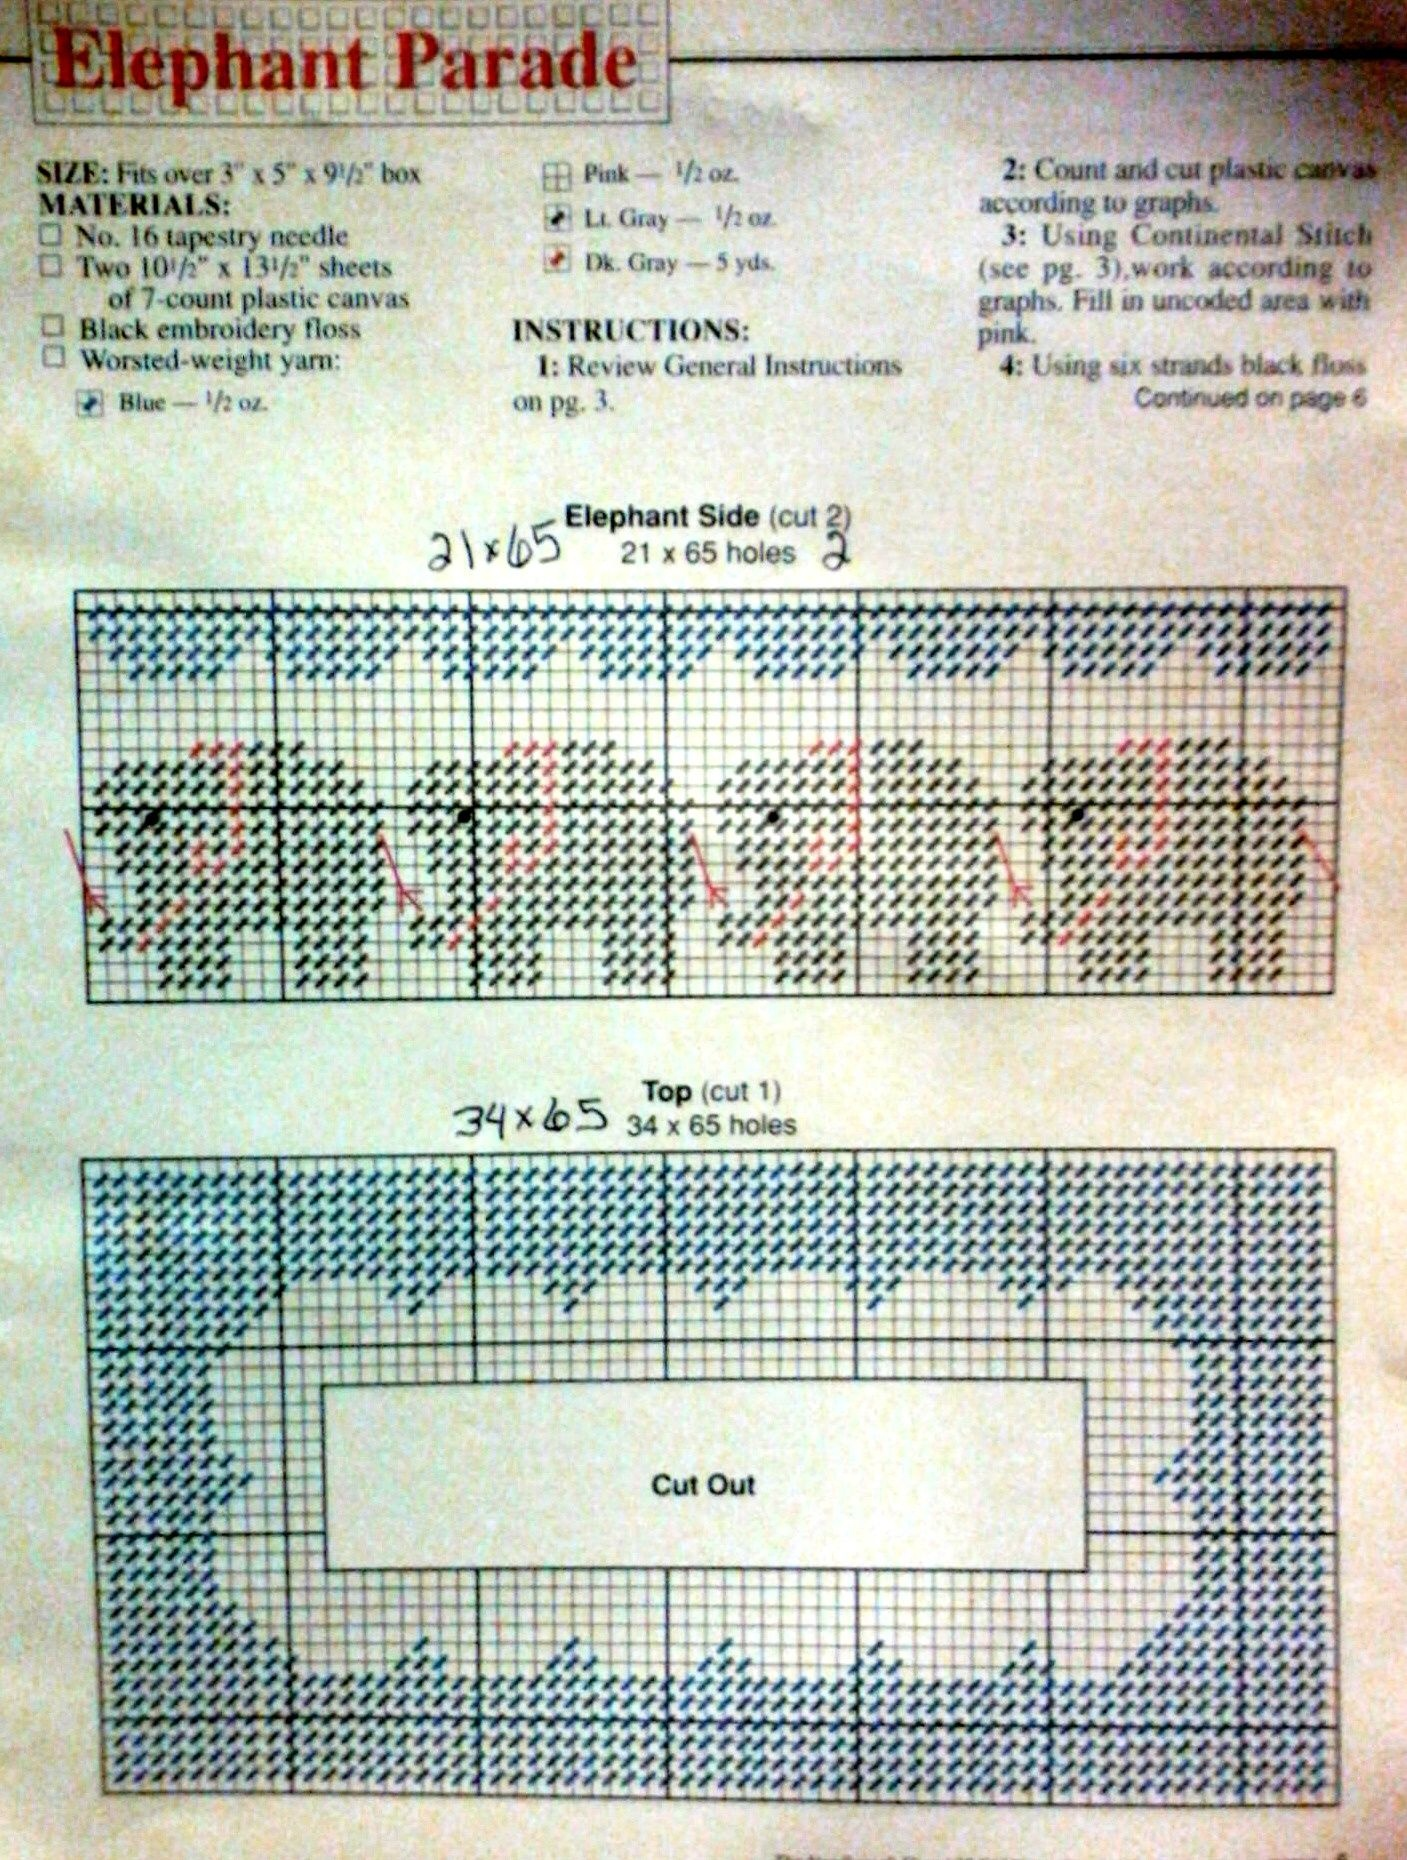 Elephant Tissue Box Pattern Plastic Canvas | Tiss-Tp Holders - Free Printable Plastic Canvas Tissue Box Patterns